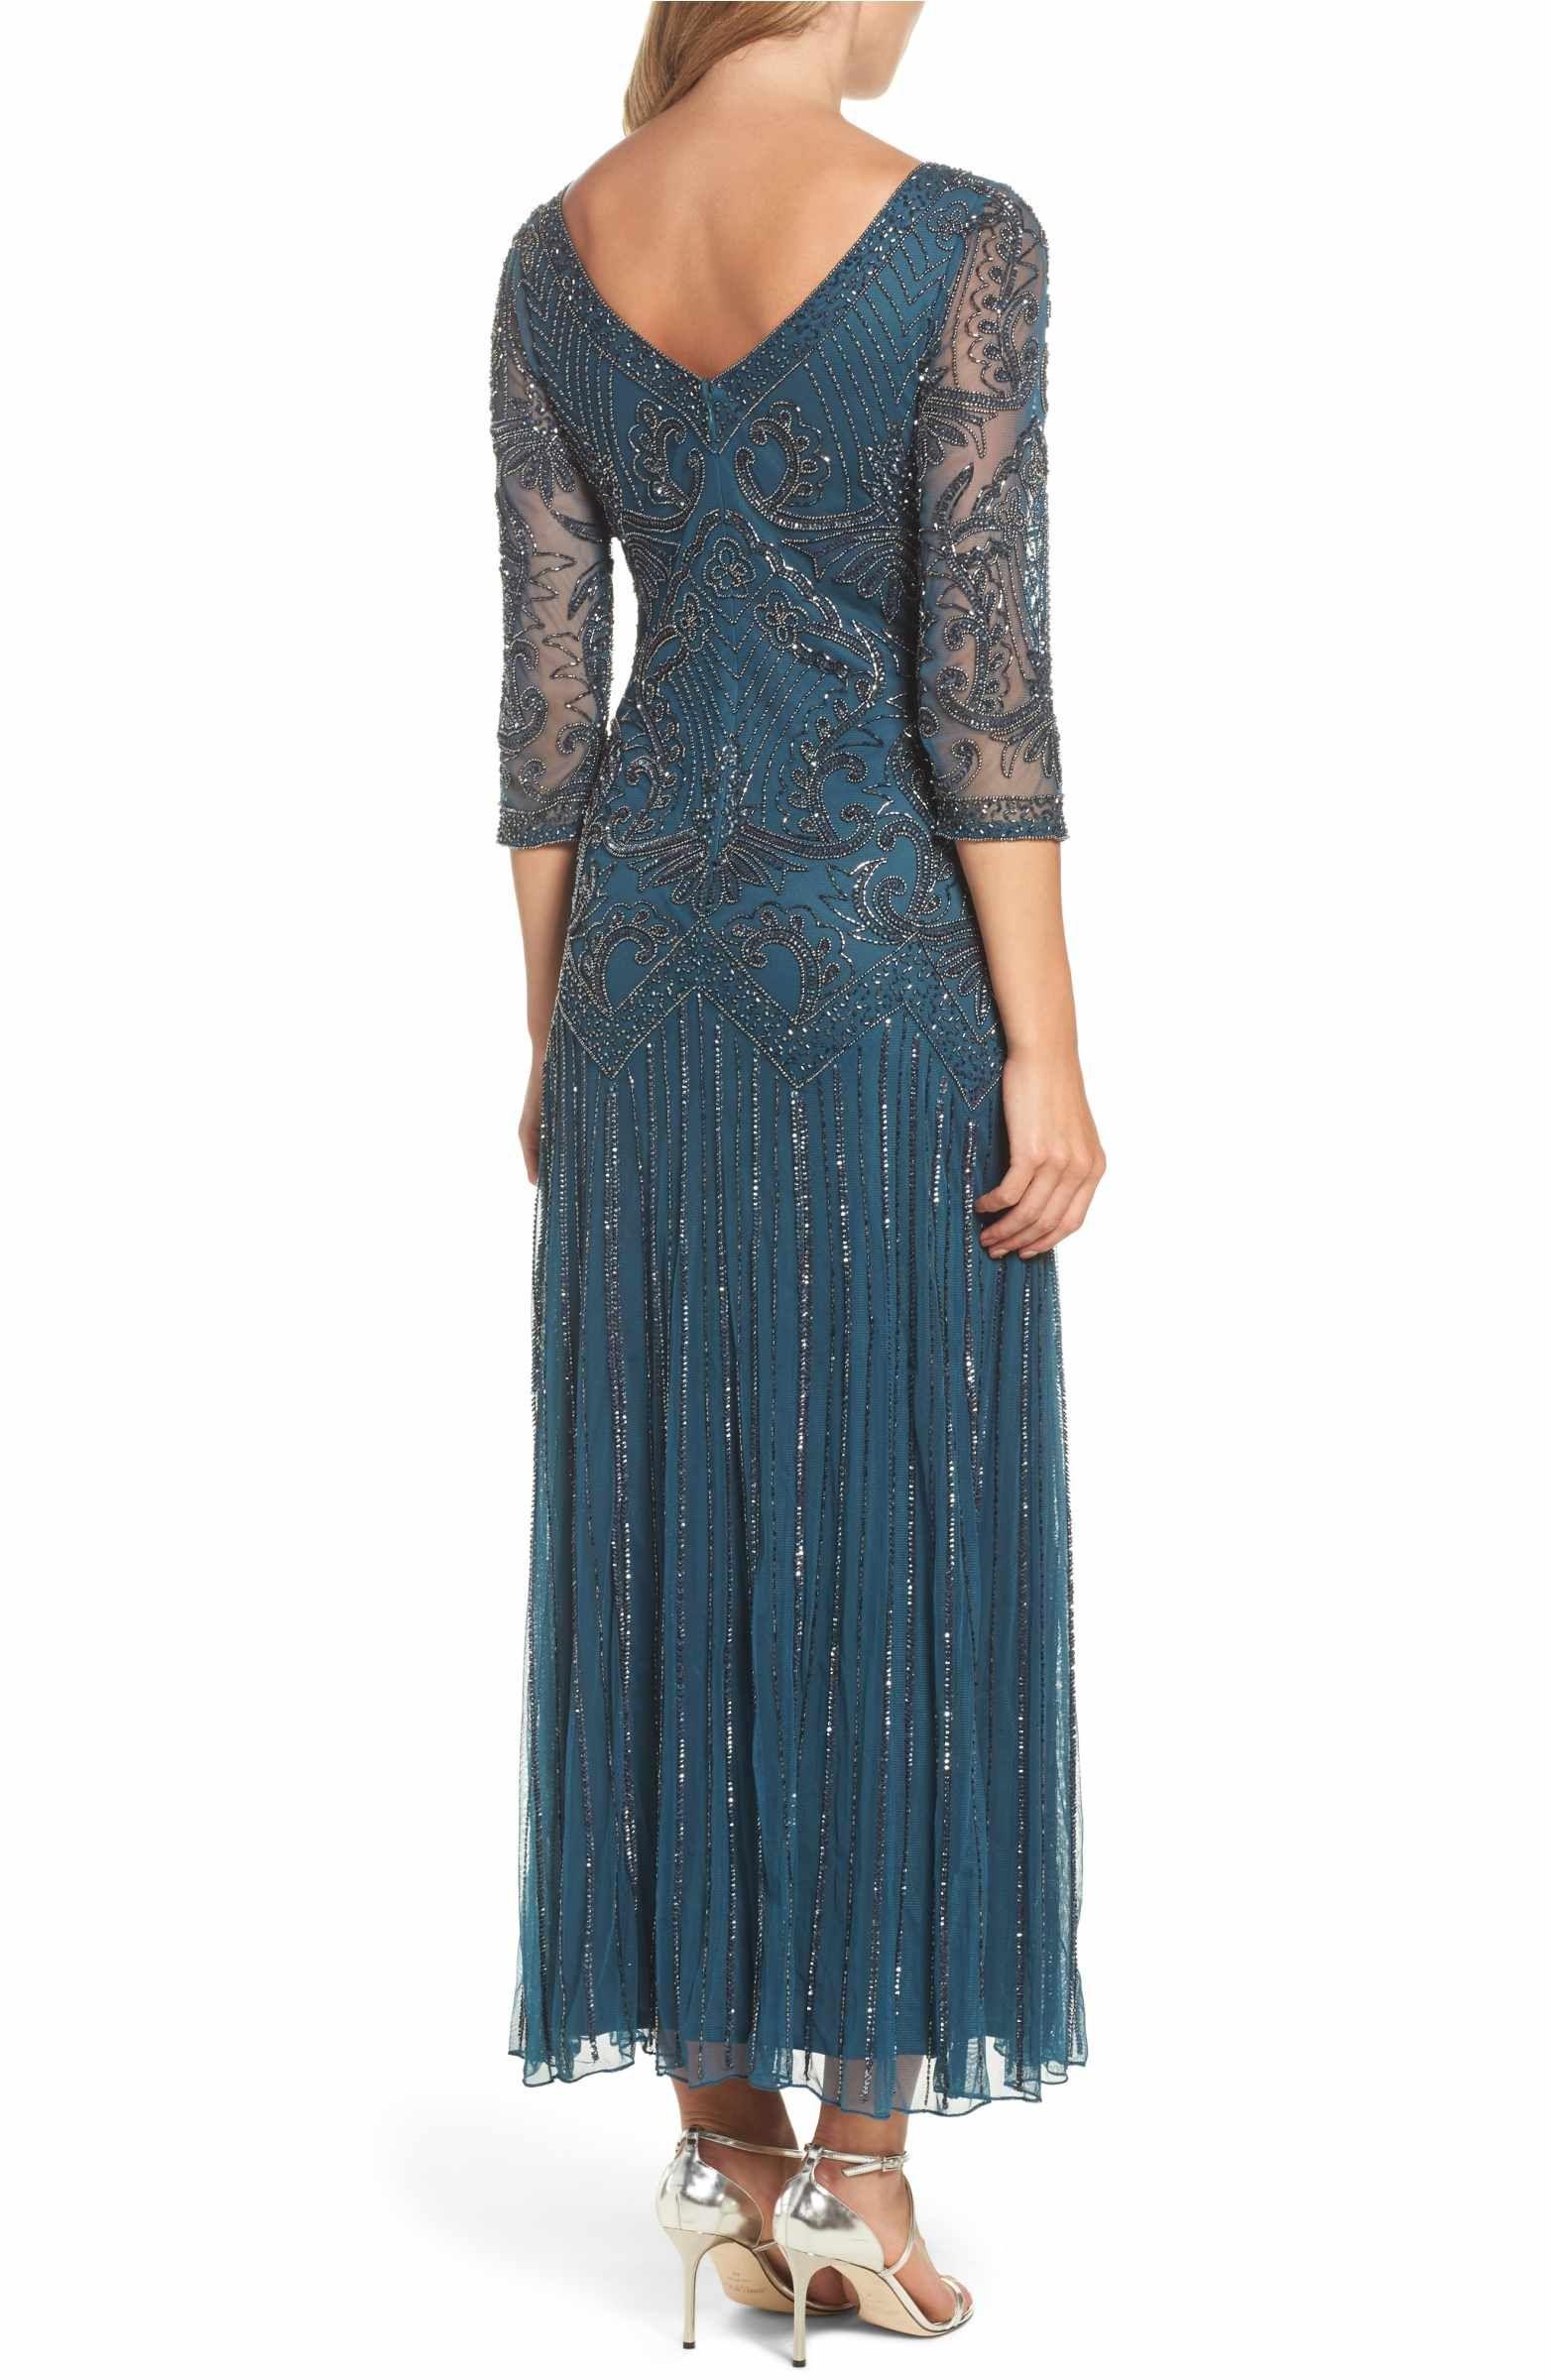 Petite dresses with sleeves for weddings  Main Image  Pisarro Nights Embellished Mesh Drop Waist Dress